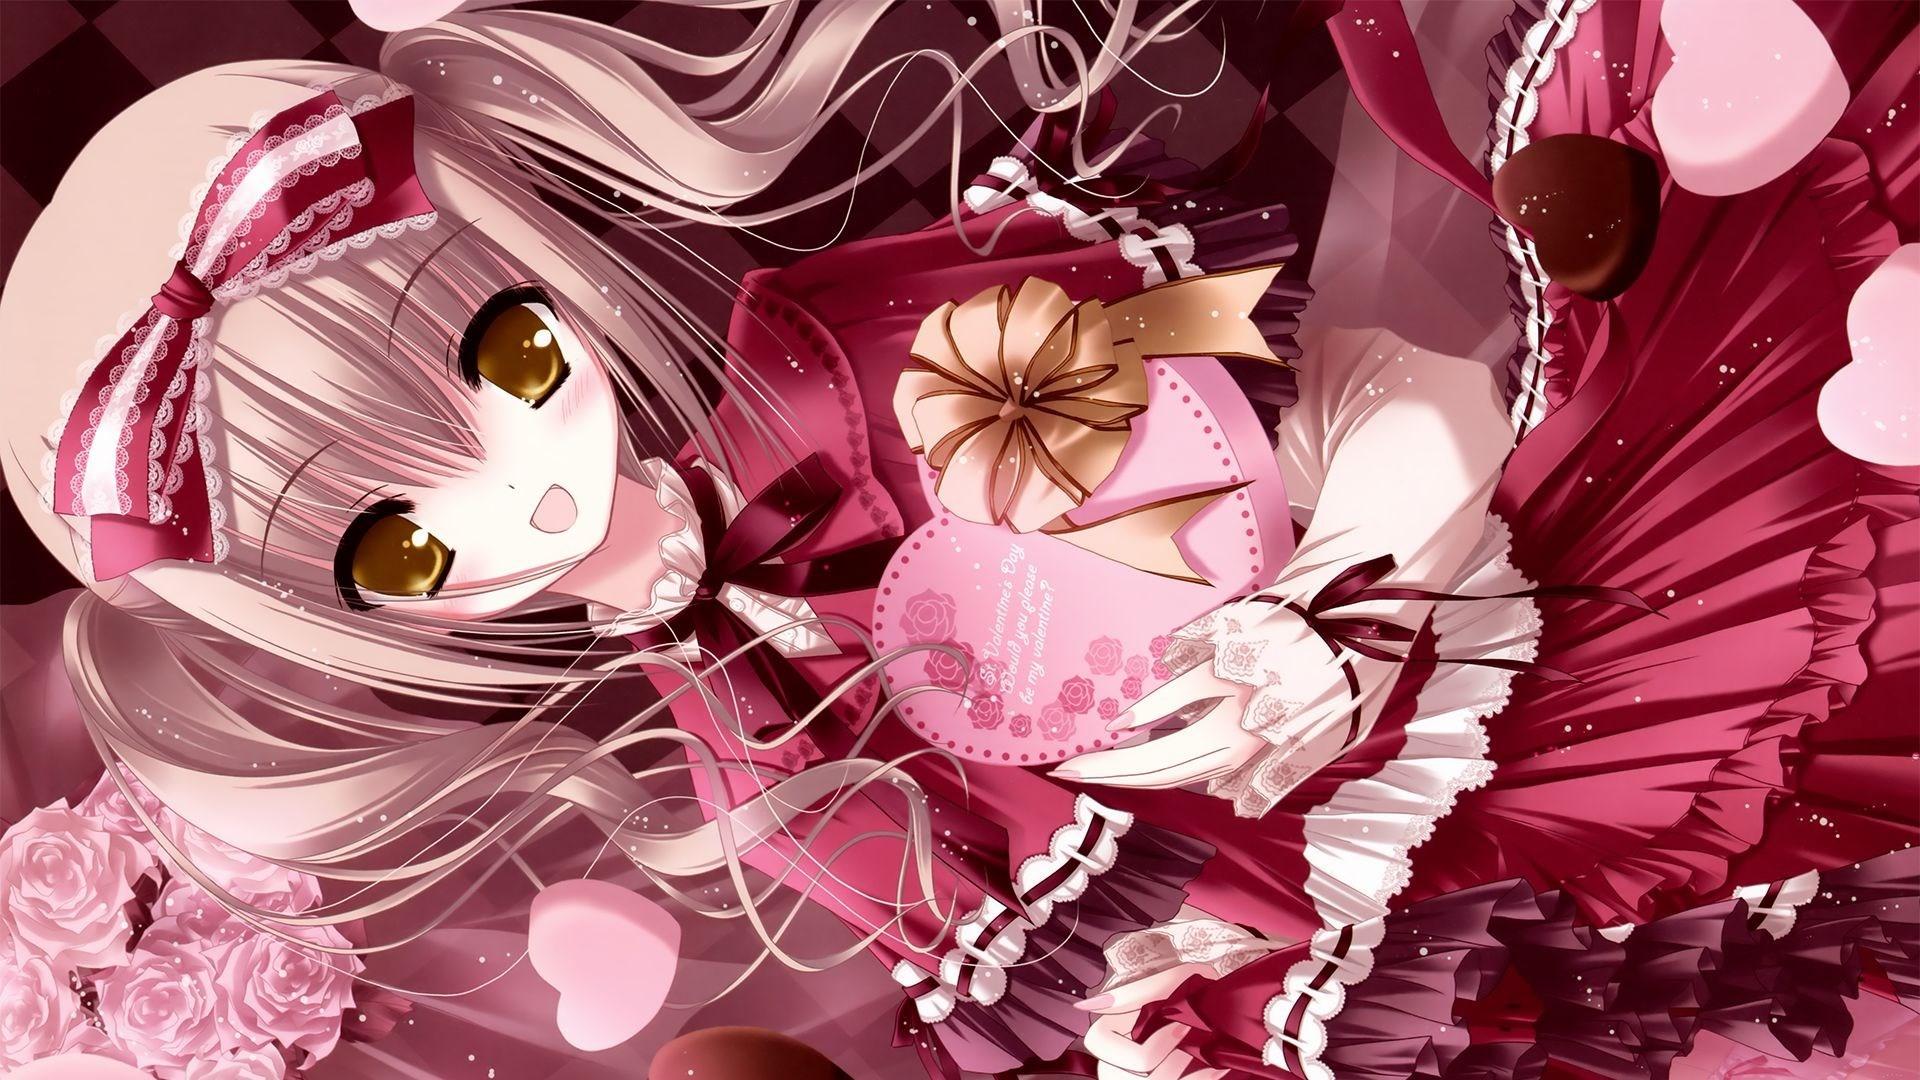 anime girl hd wallpapers 1080p high quality